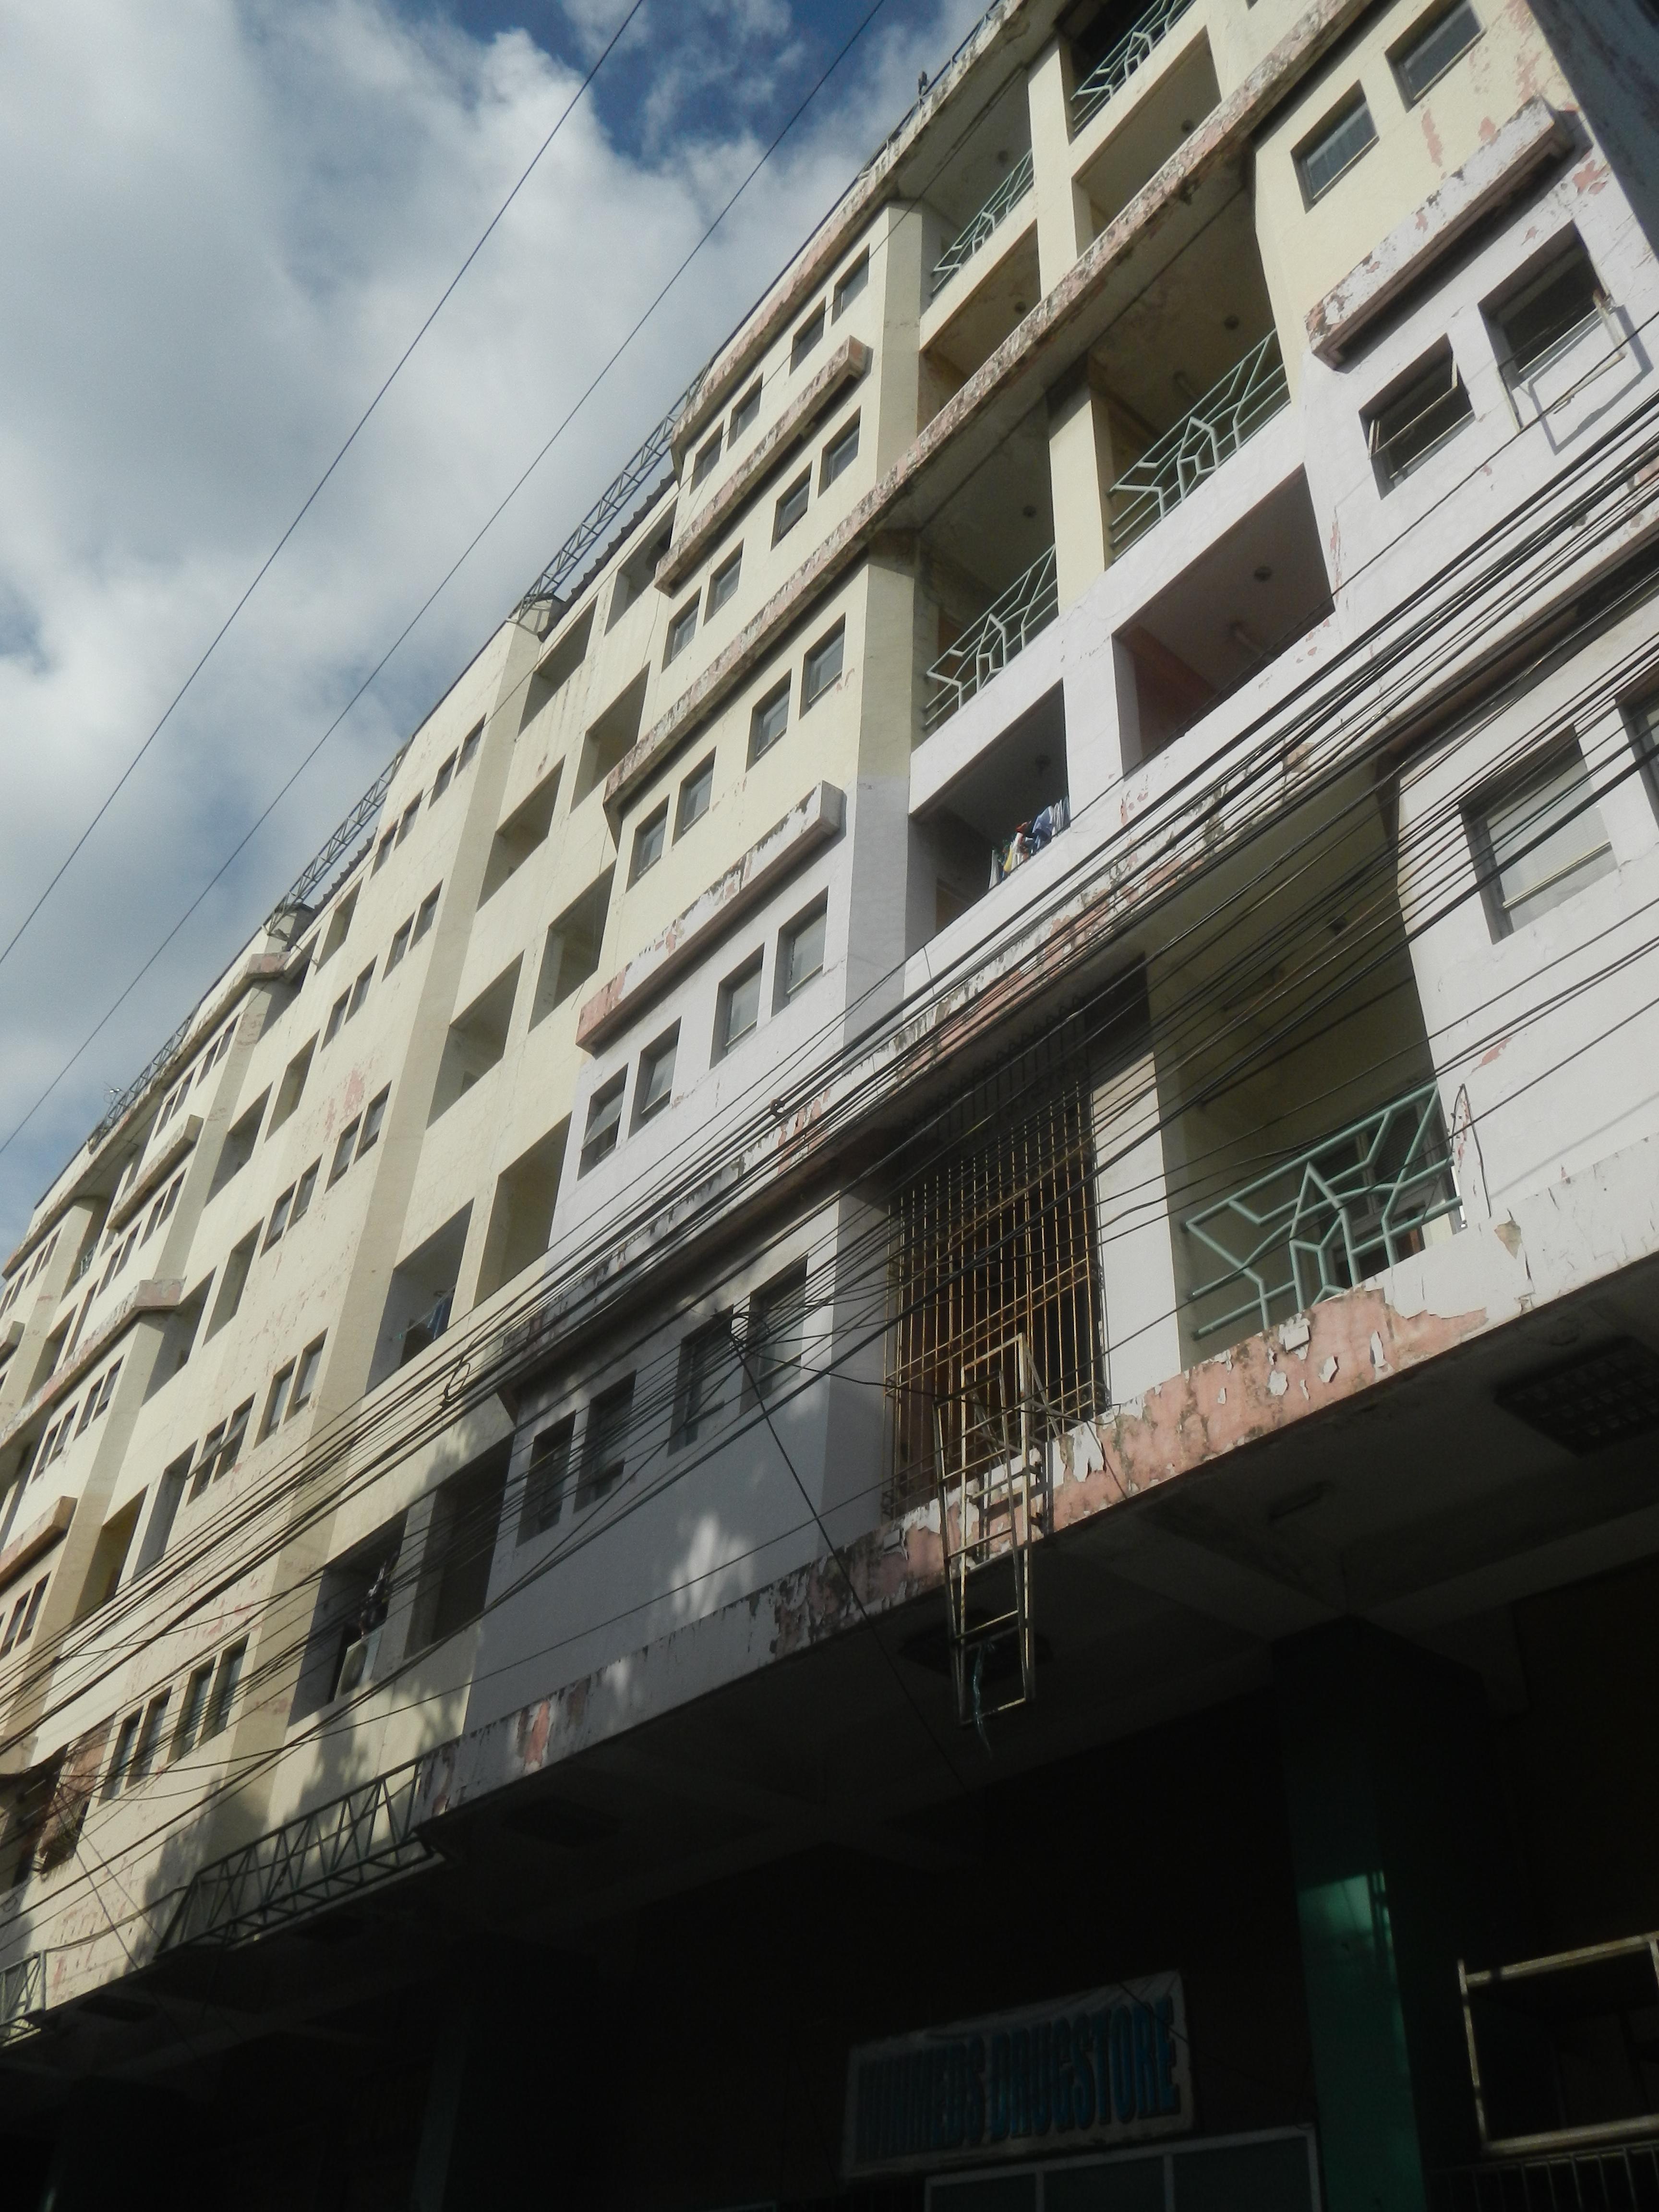 File:803Western Bicutan, Taguig City 07 jpg - Wikimedia Commons